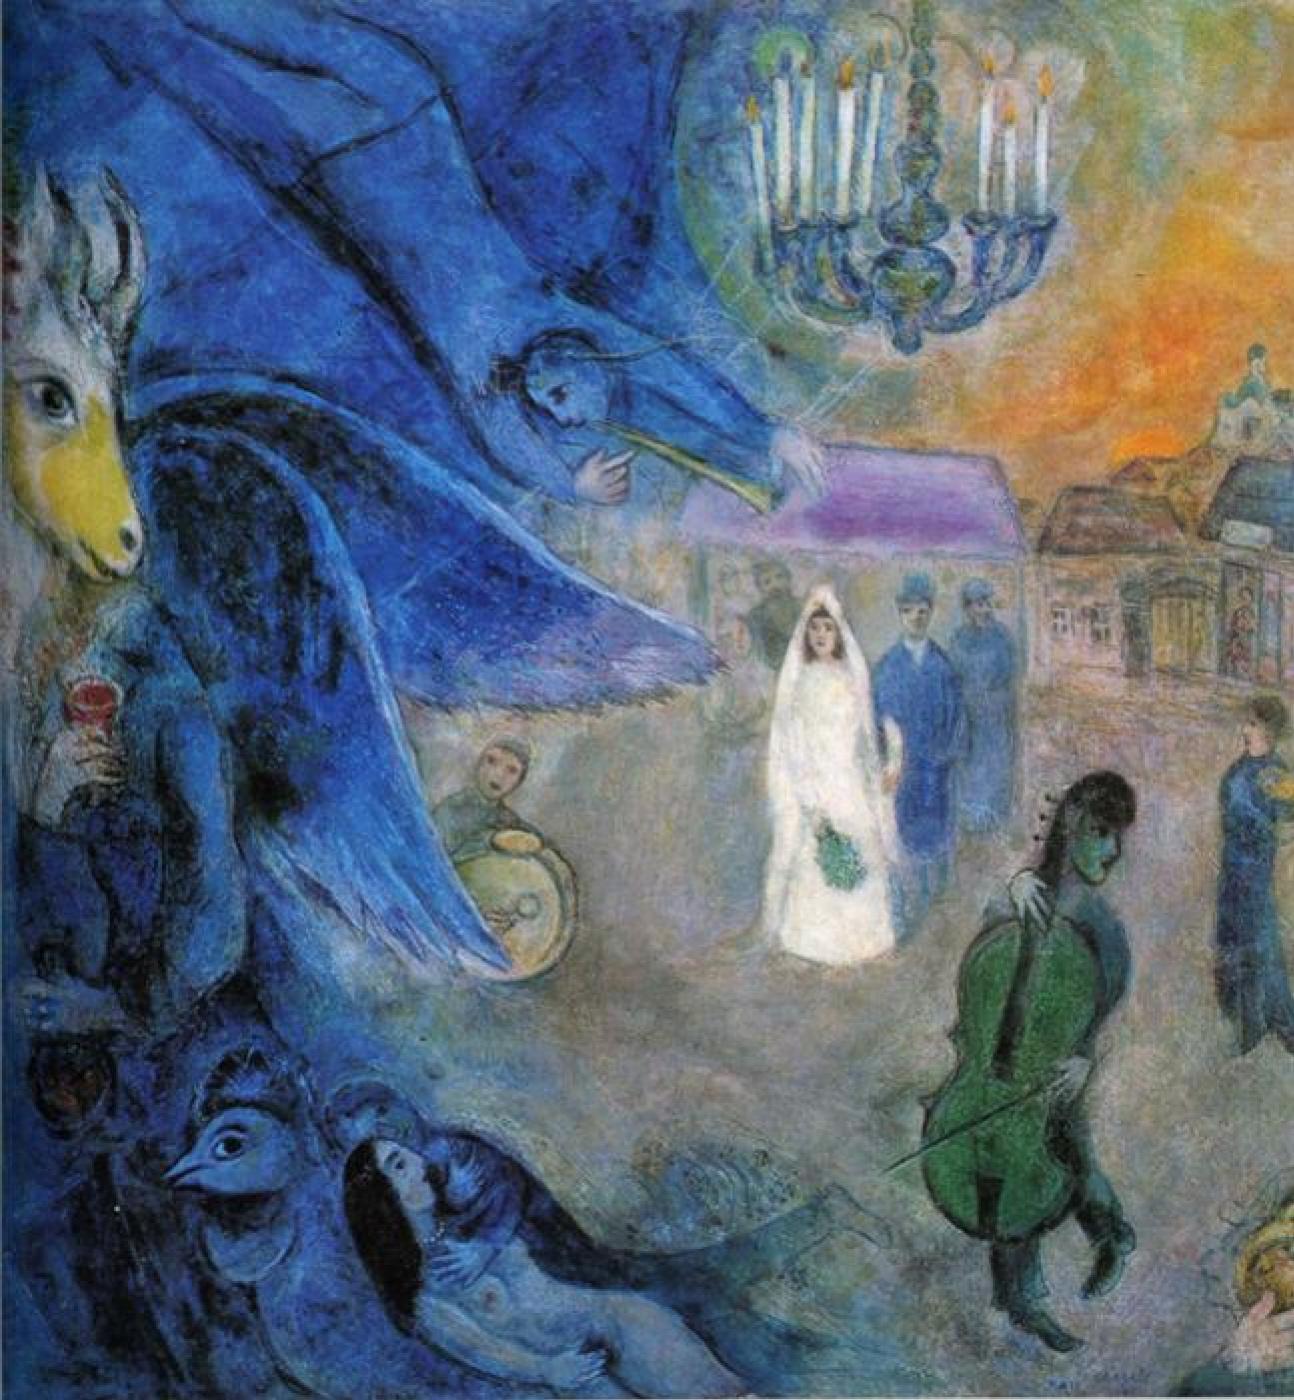 Марк Захарович Шагал. Свадебные свечи